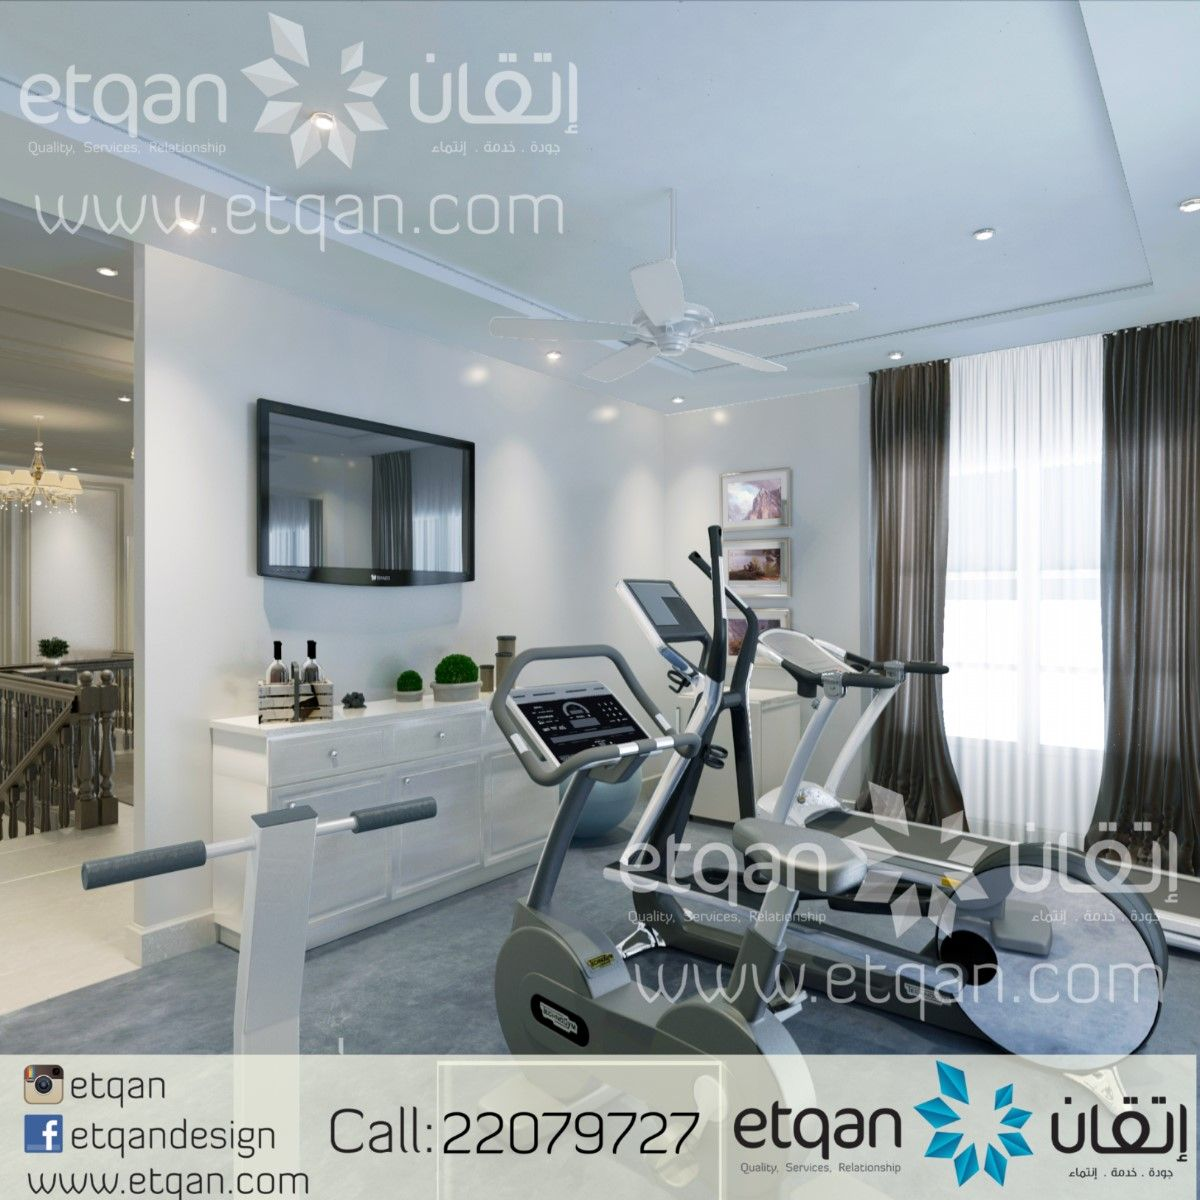 تصميم ديكورات صالة رياضية منزلية اتقان Etqan تصميم داخلي ديكور صالة رياضة حديث ديكورات Decore Gym Room Oman Muscat I Home Decor Design Home